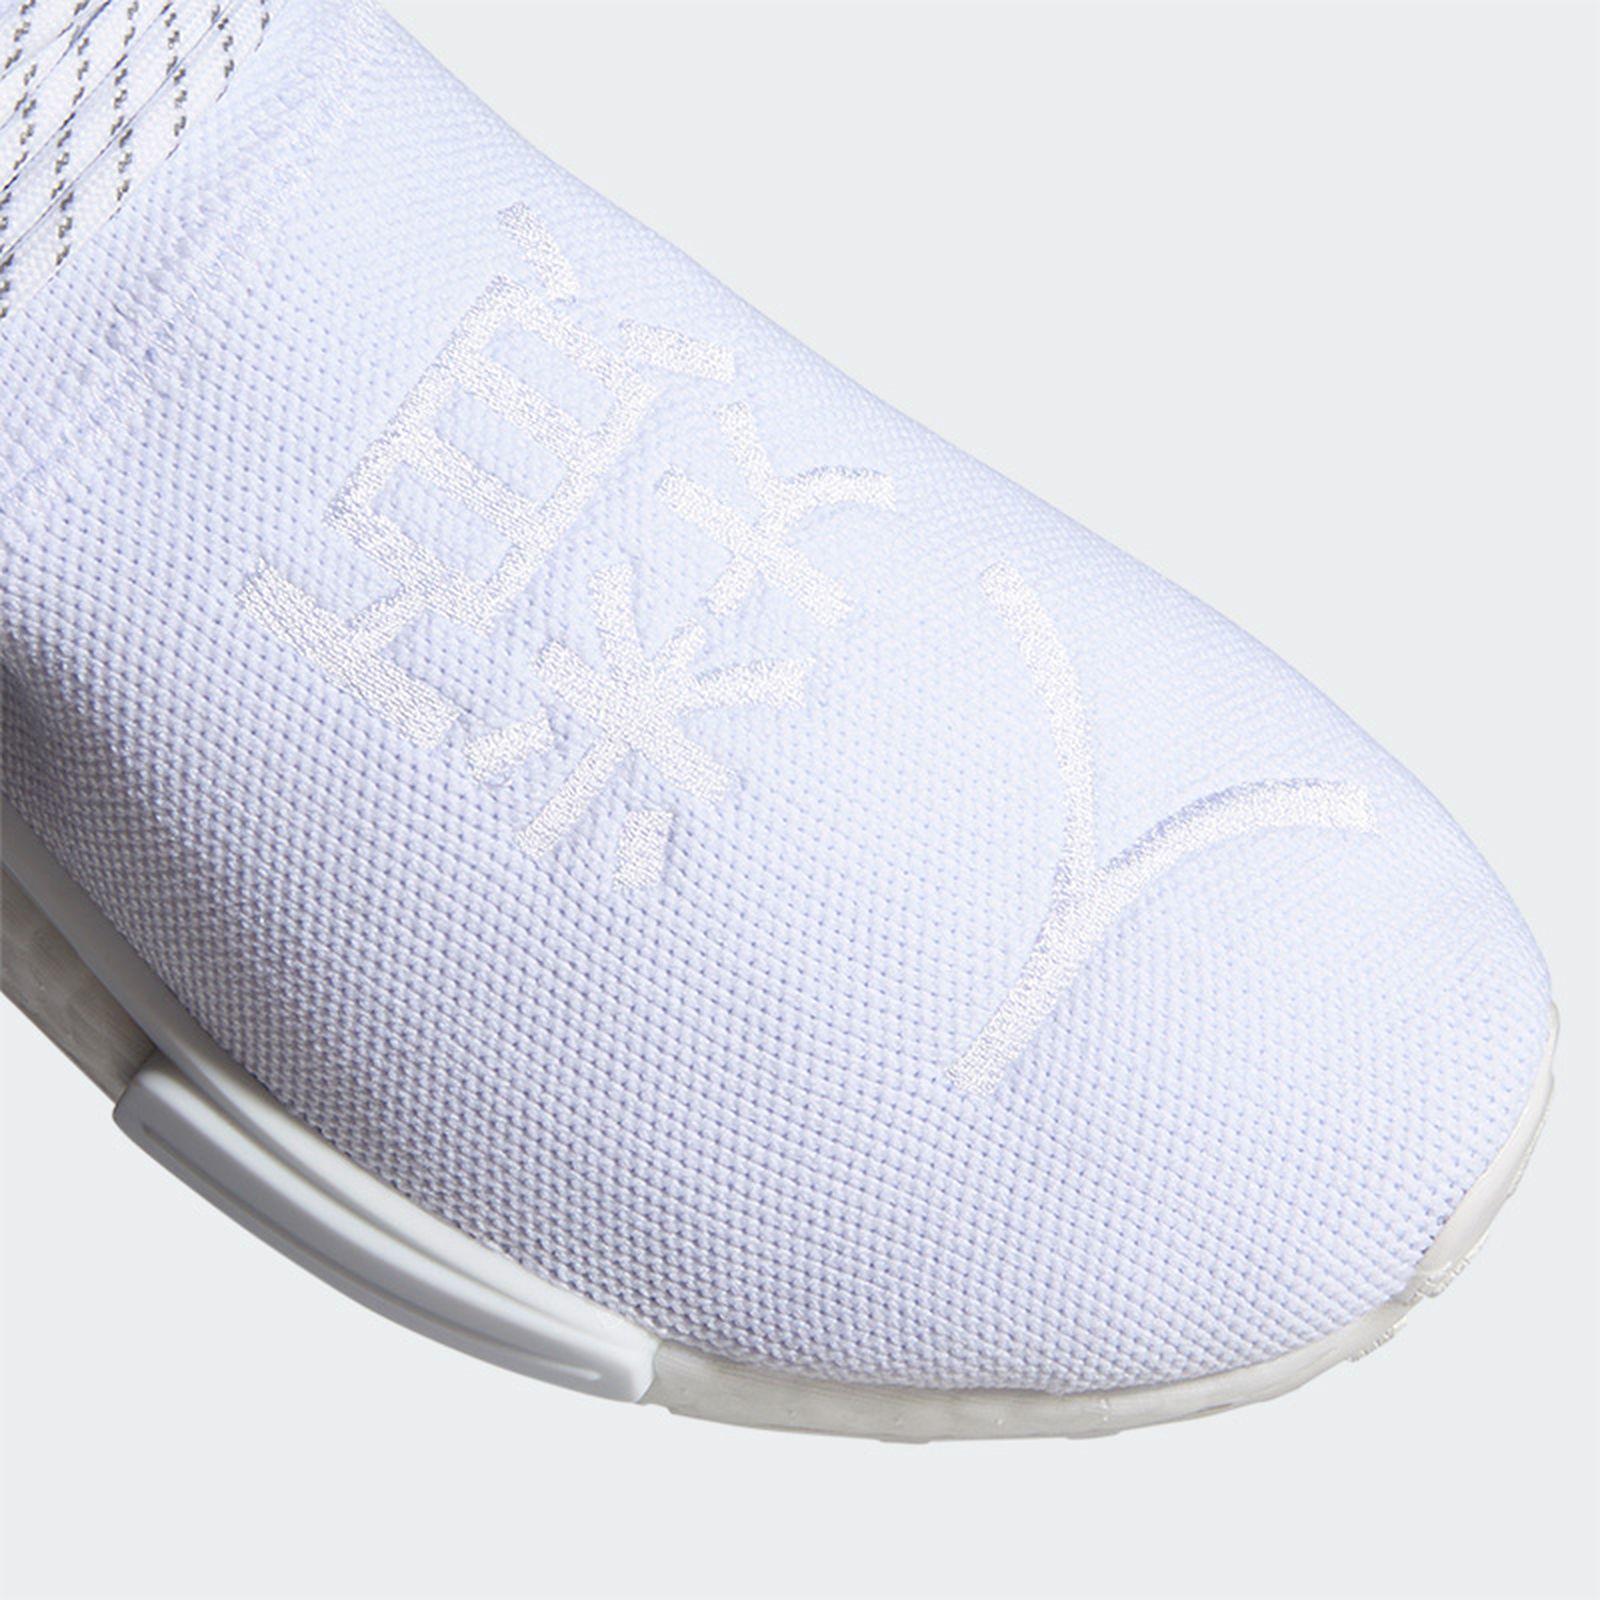 pharrell-williams-adidas-hu-nmd-white-release-date-price-04